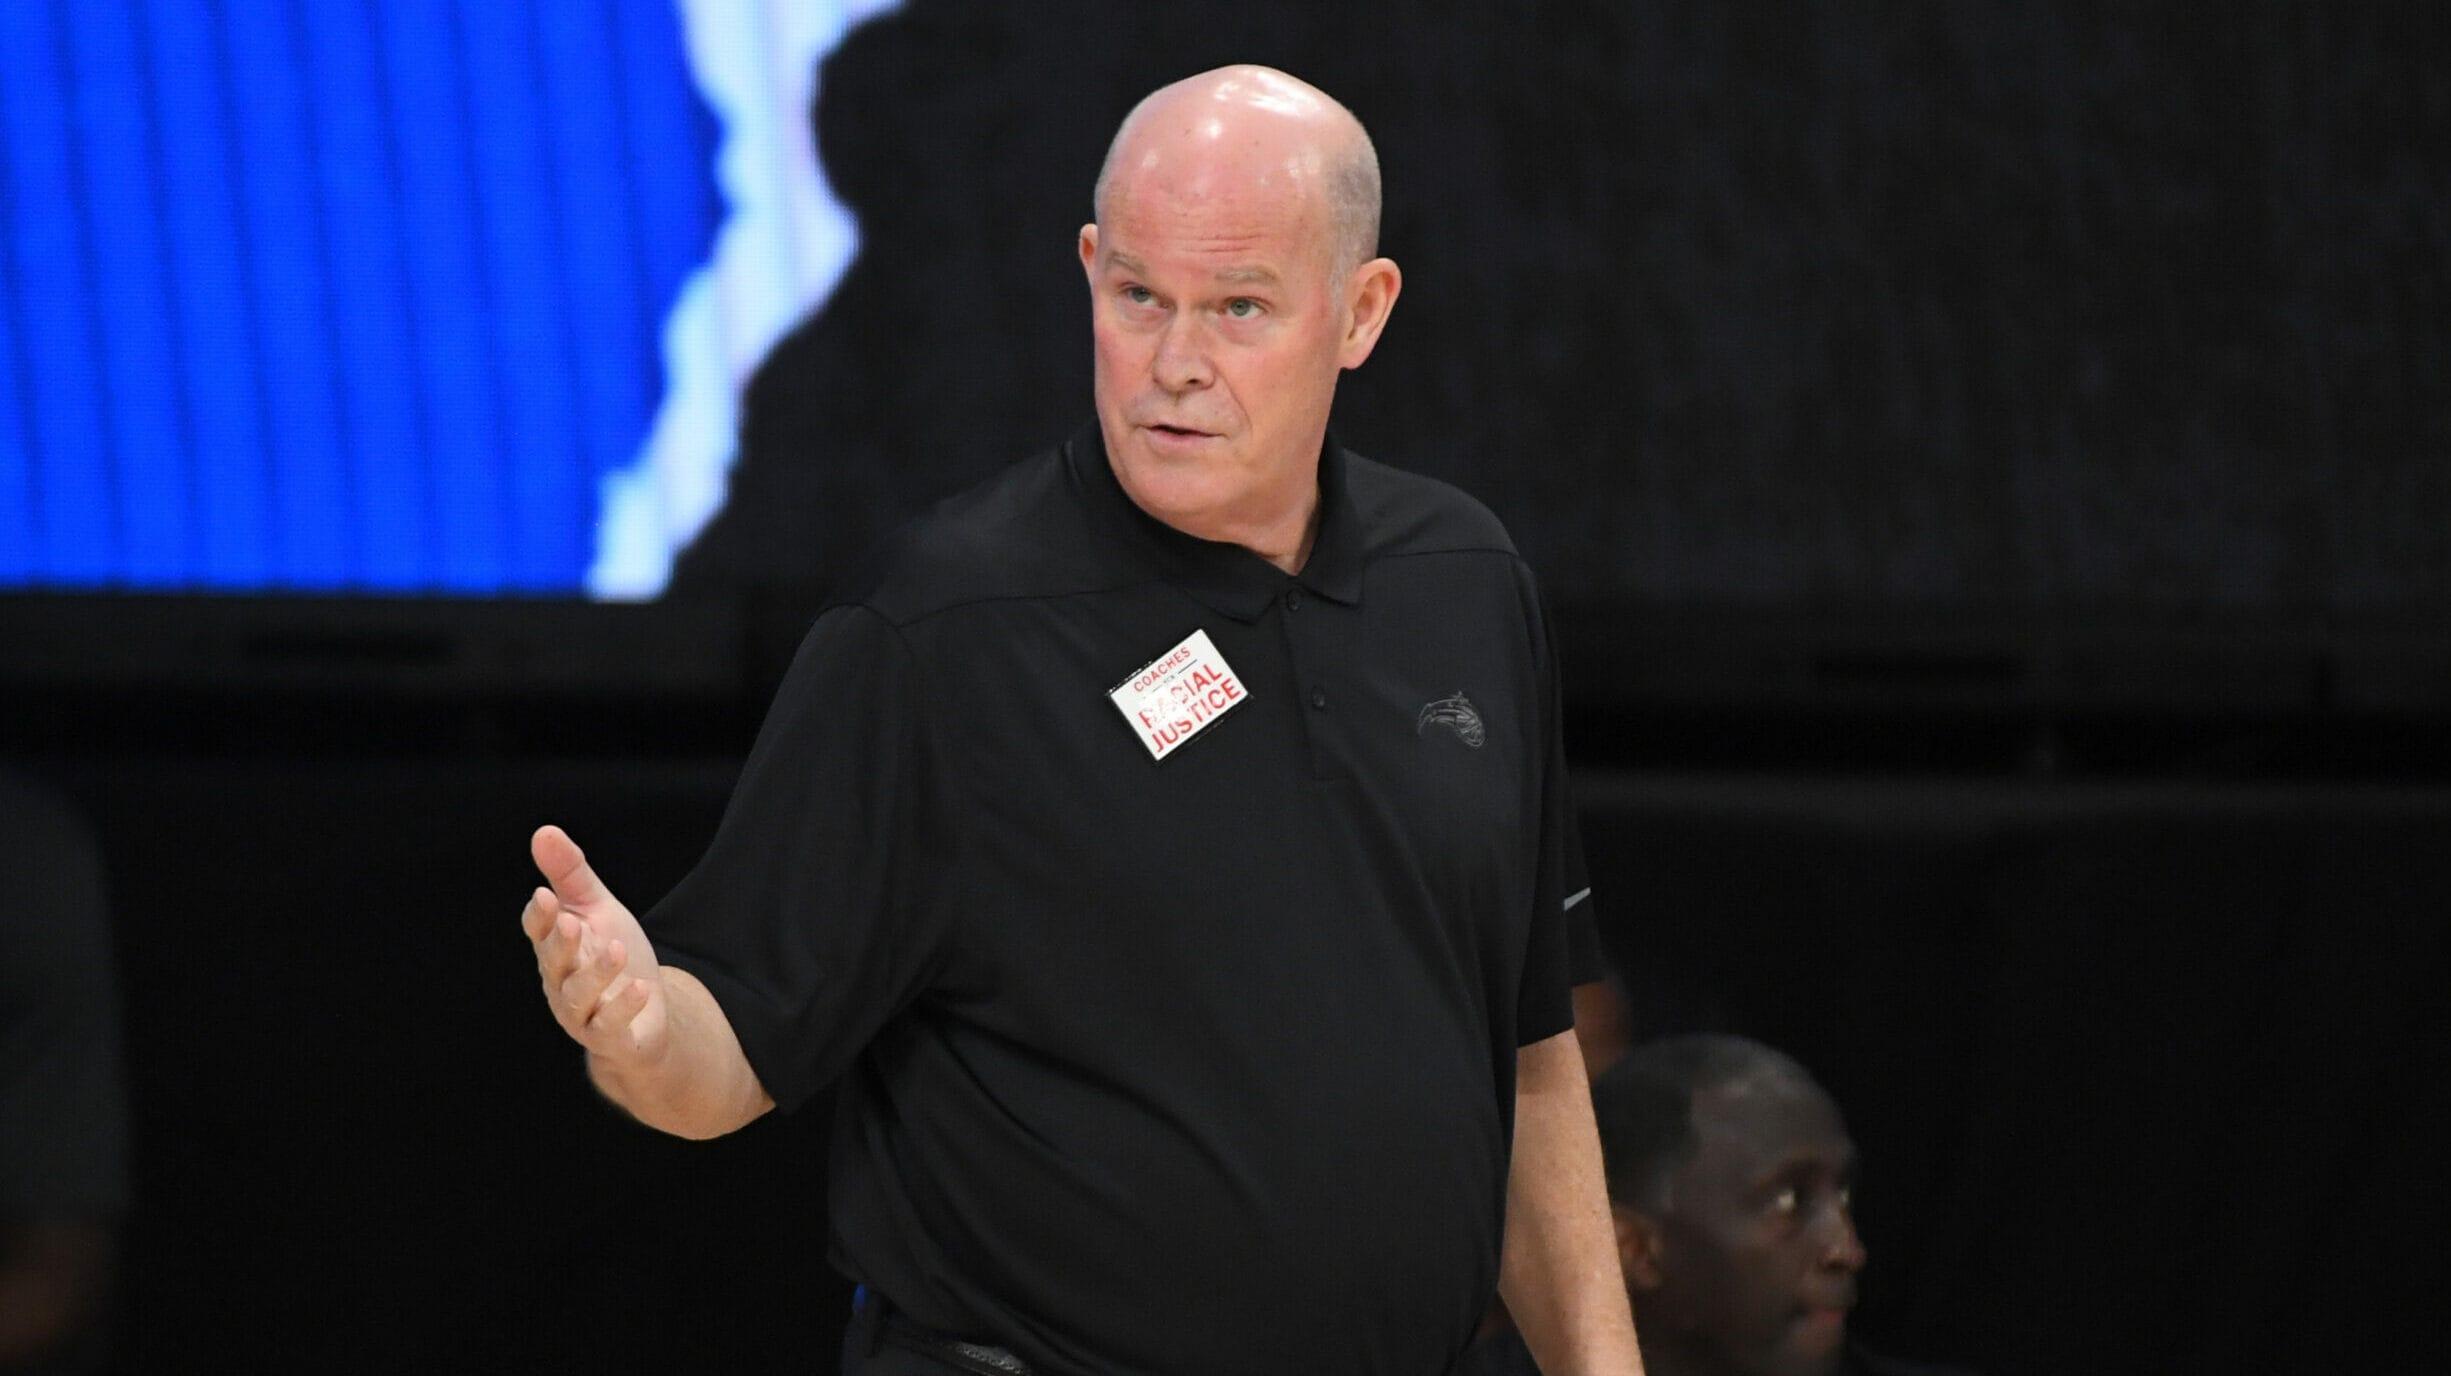 Orlando Magic, coach Steve Clifford agree to part ways